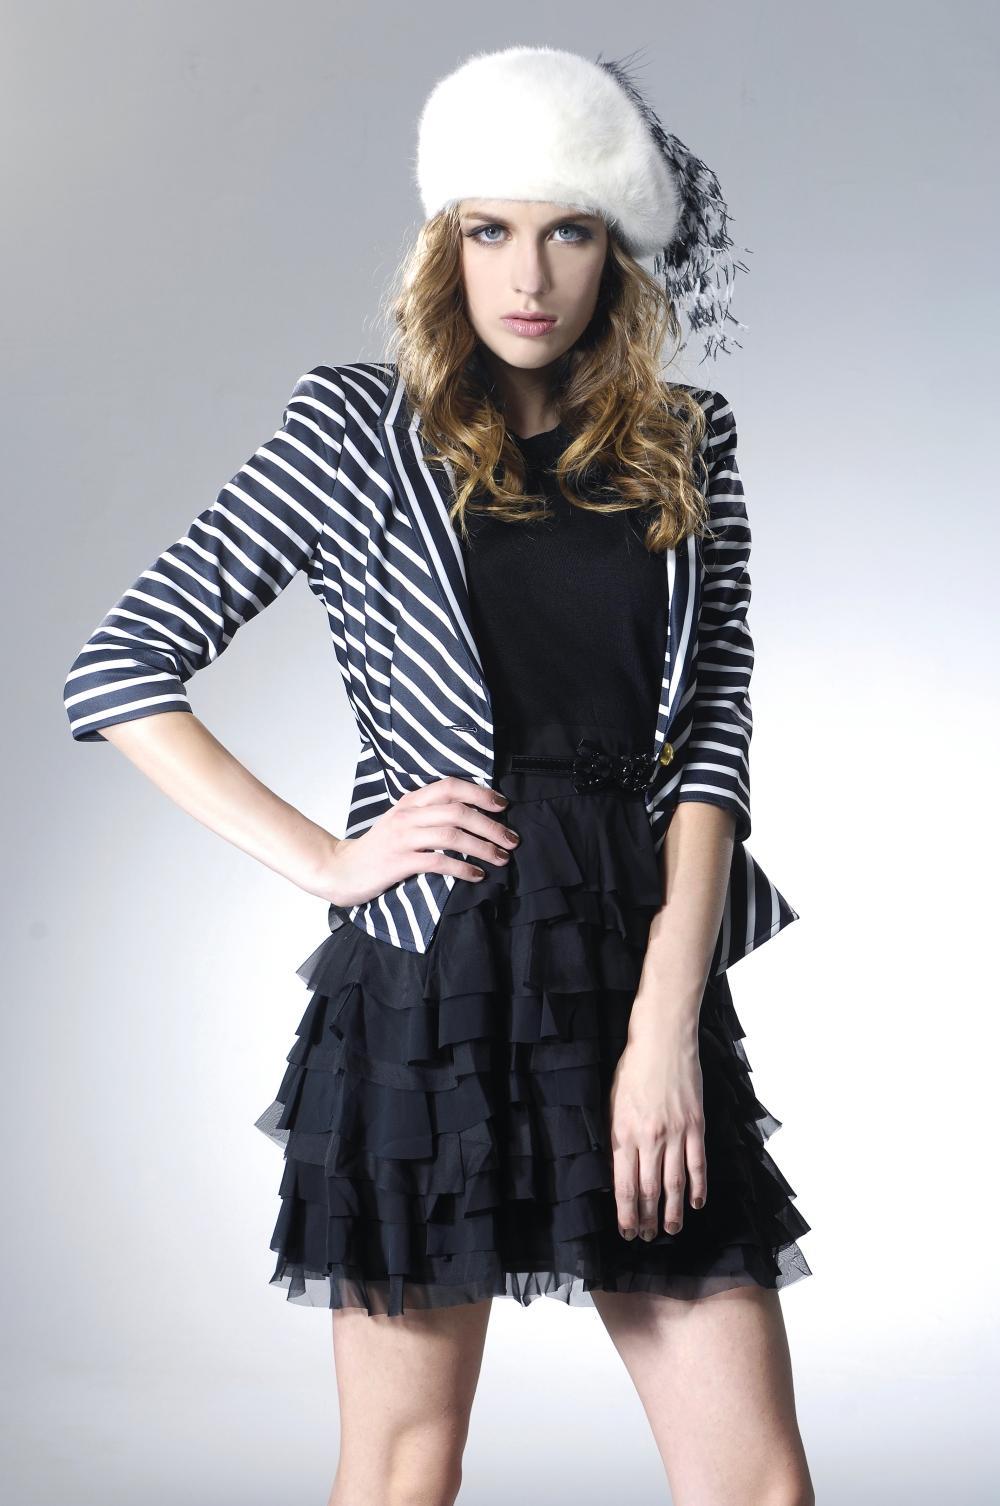 fashionable winter dress